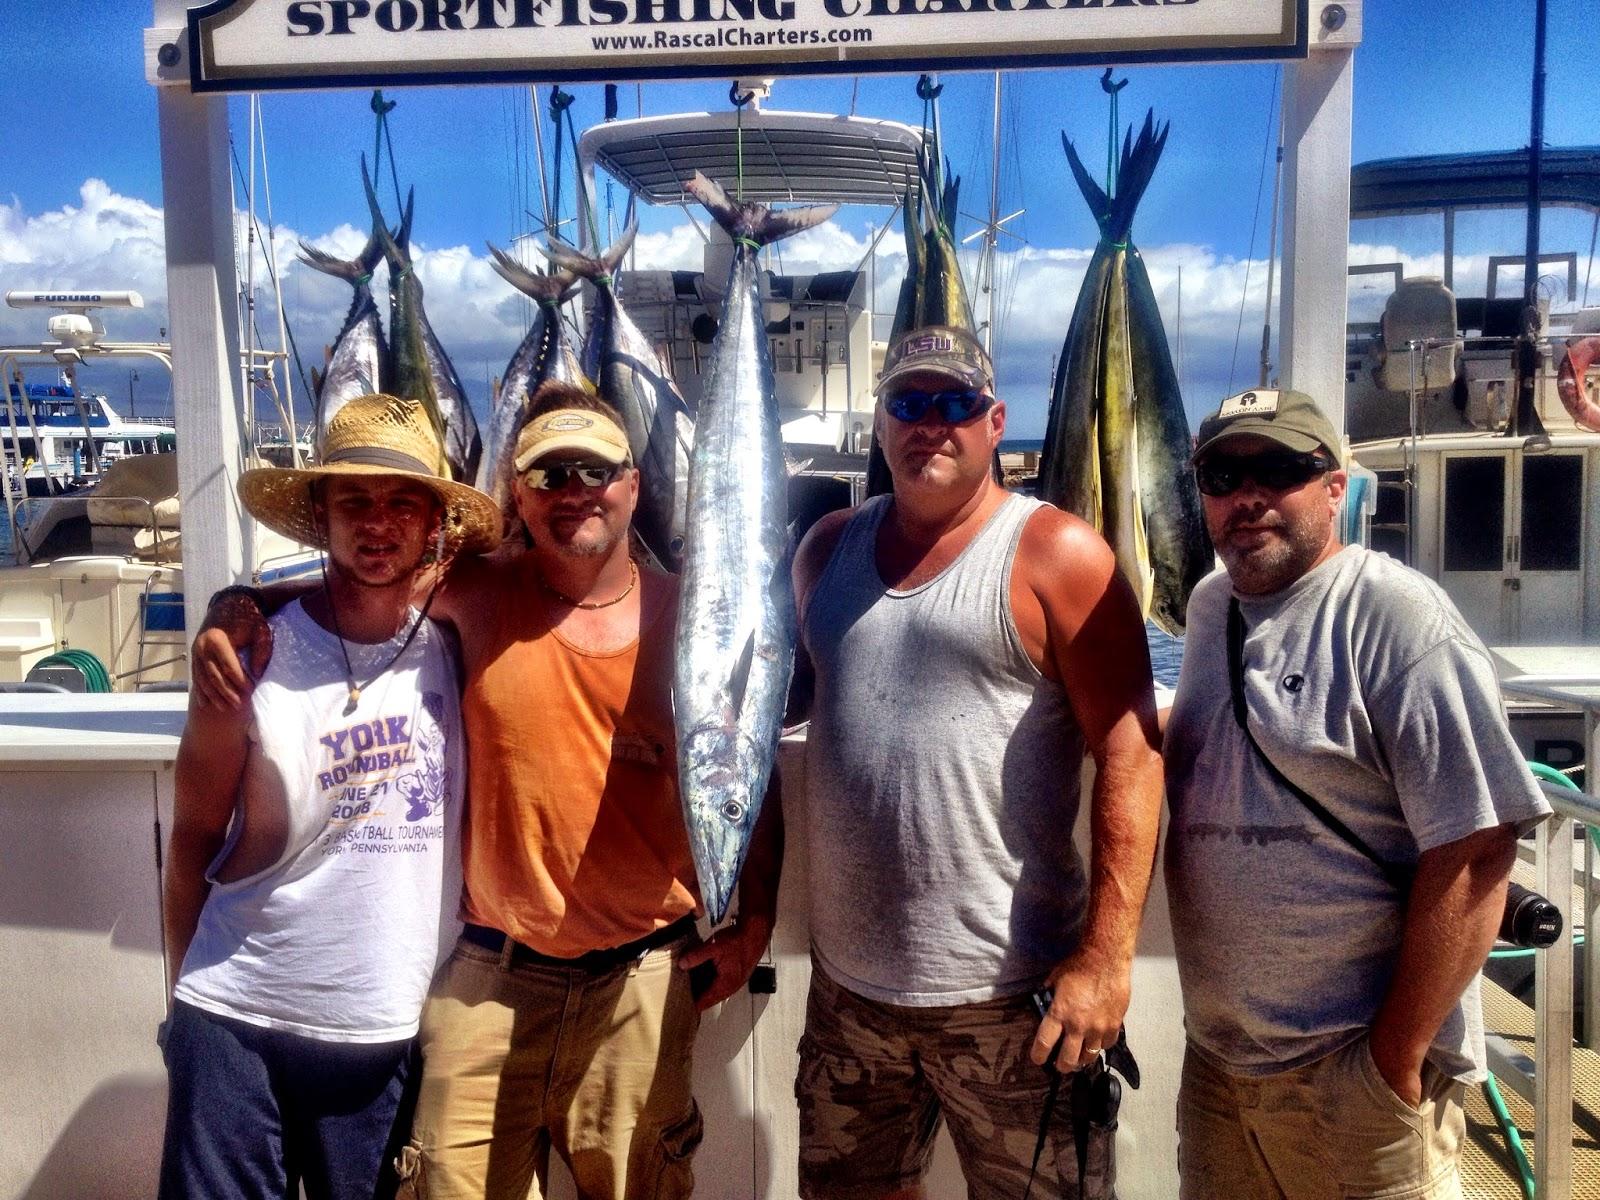 Catch of the Day: Mahi Mahi, Ahi, Aku Tuna and Ono, plus a small Marlin